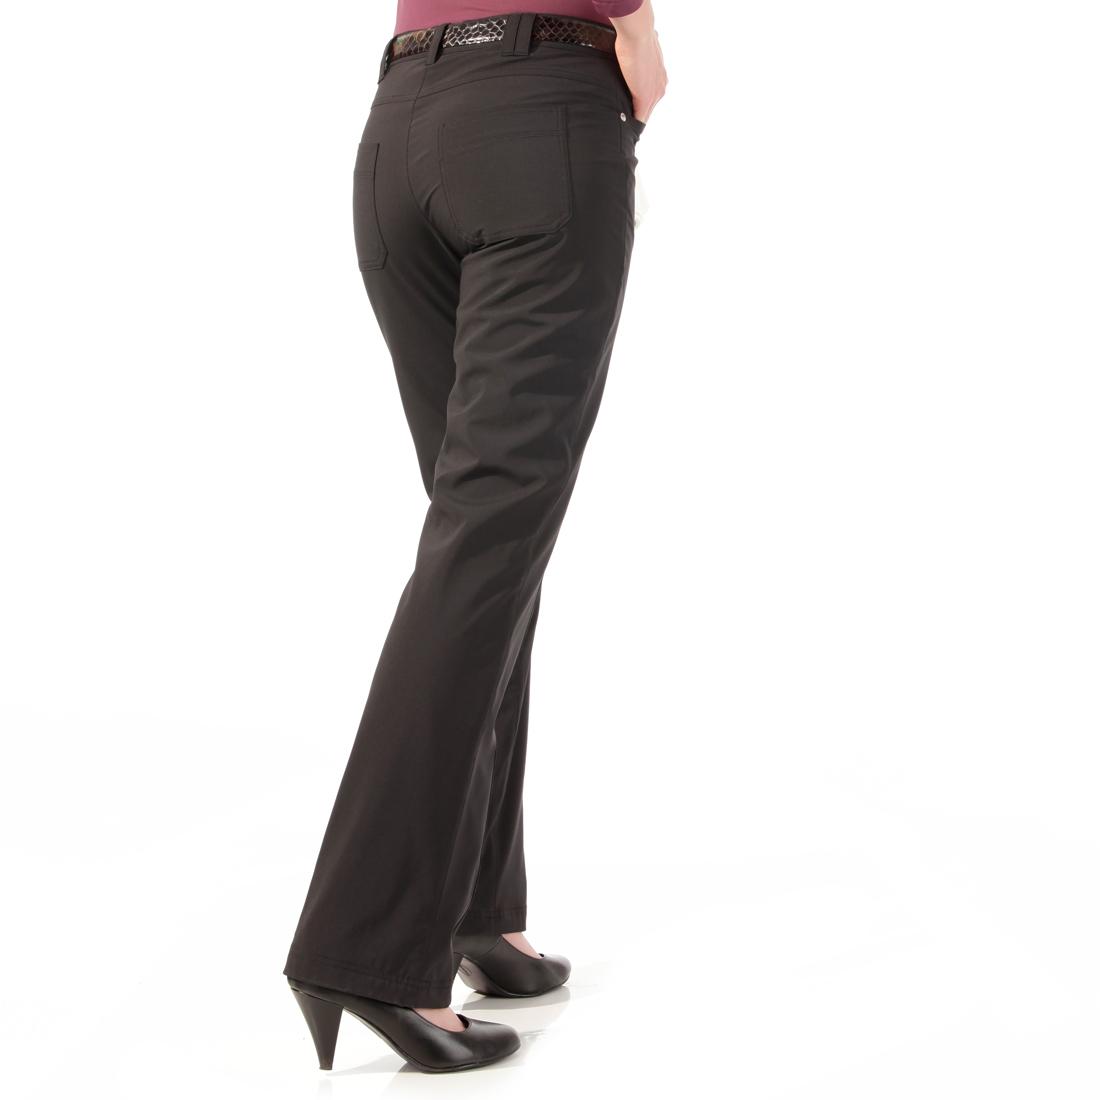 Damen Allwetter-Hose aus Technostretch-Faser